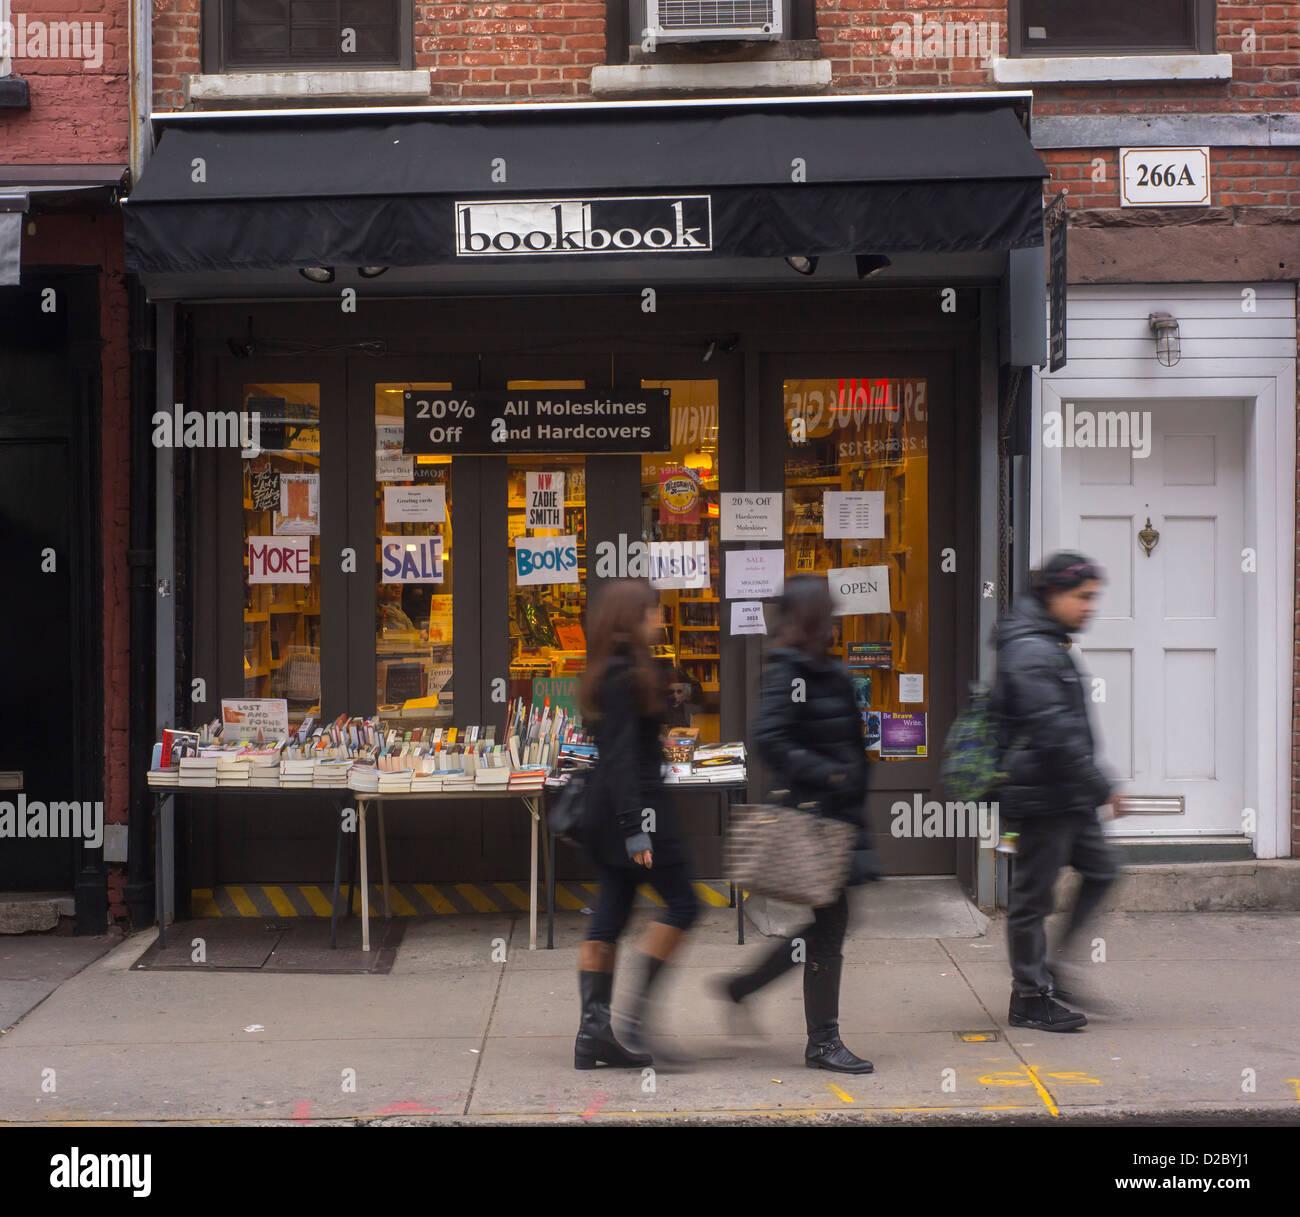 'bookbook', an independent bookstore is seen on Bleecker Street in the Greenwich Village neighborhood of - Stock Image